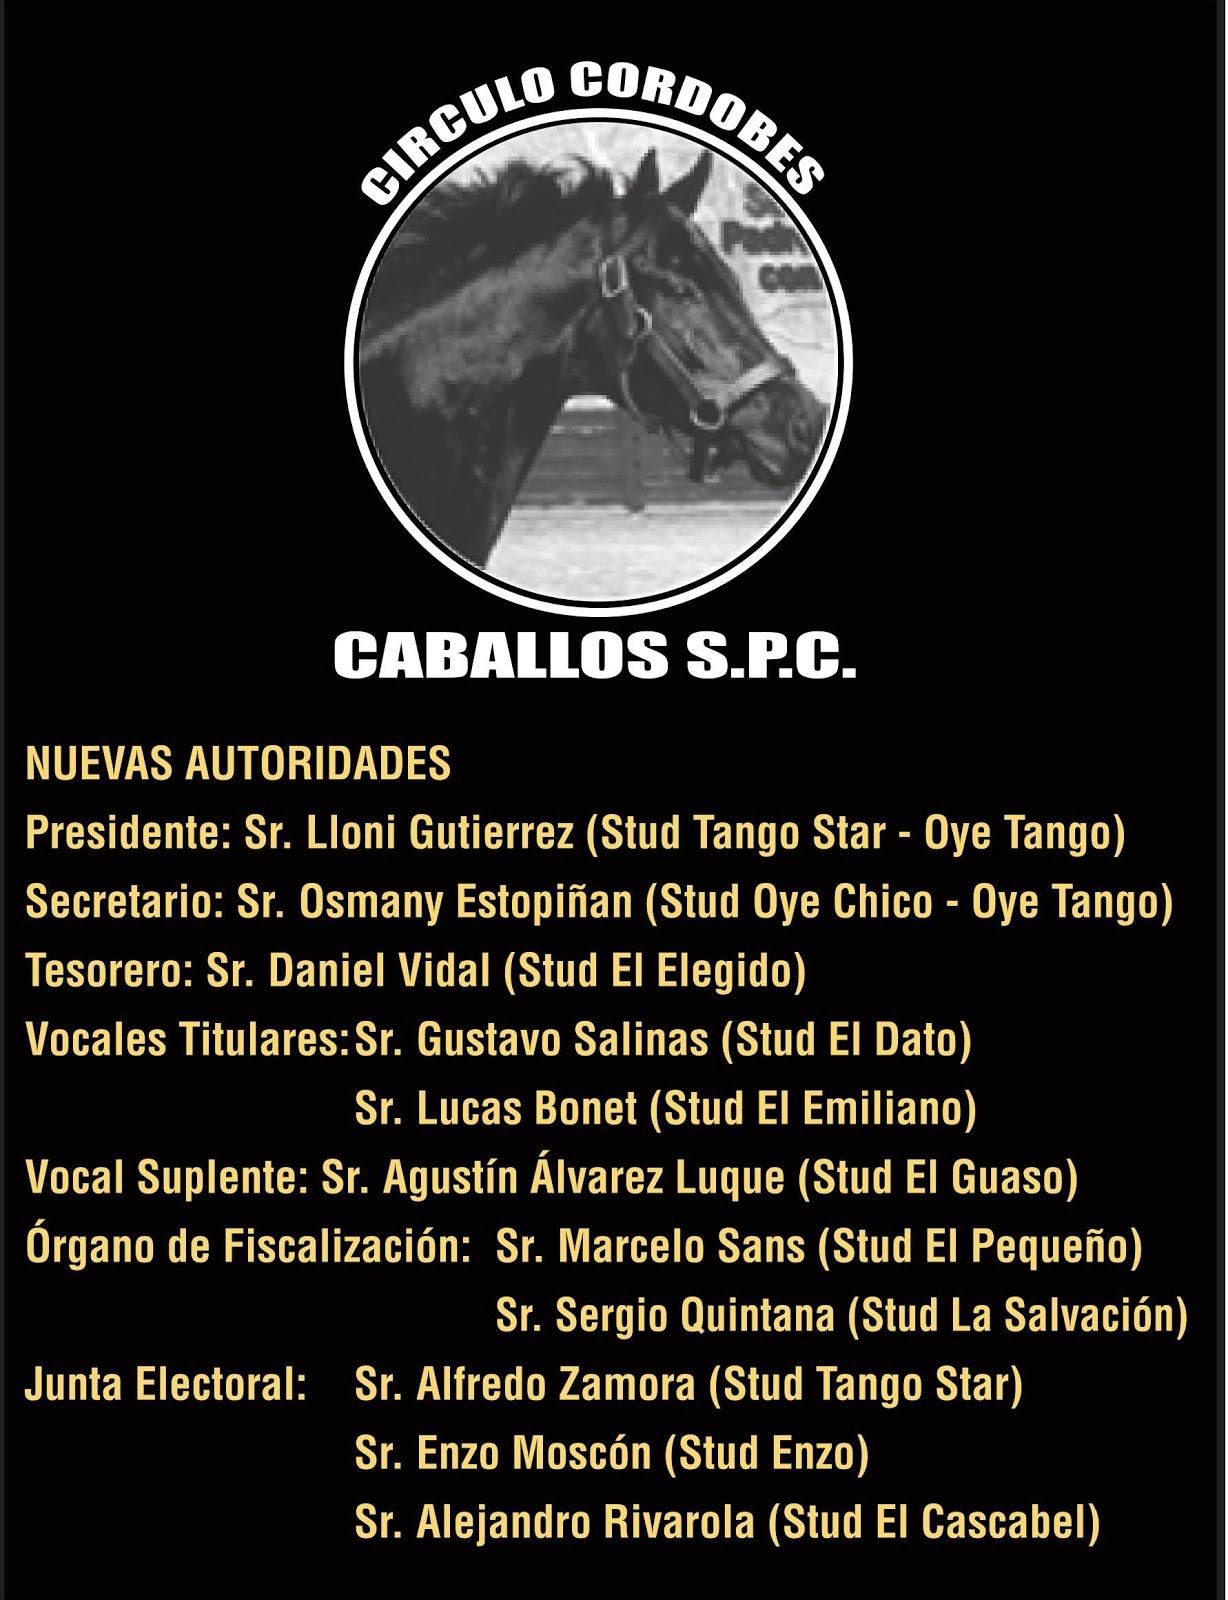 CIRCULO CORDOBÉS DE PROP